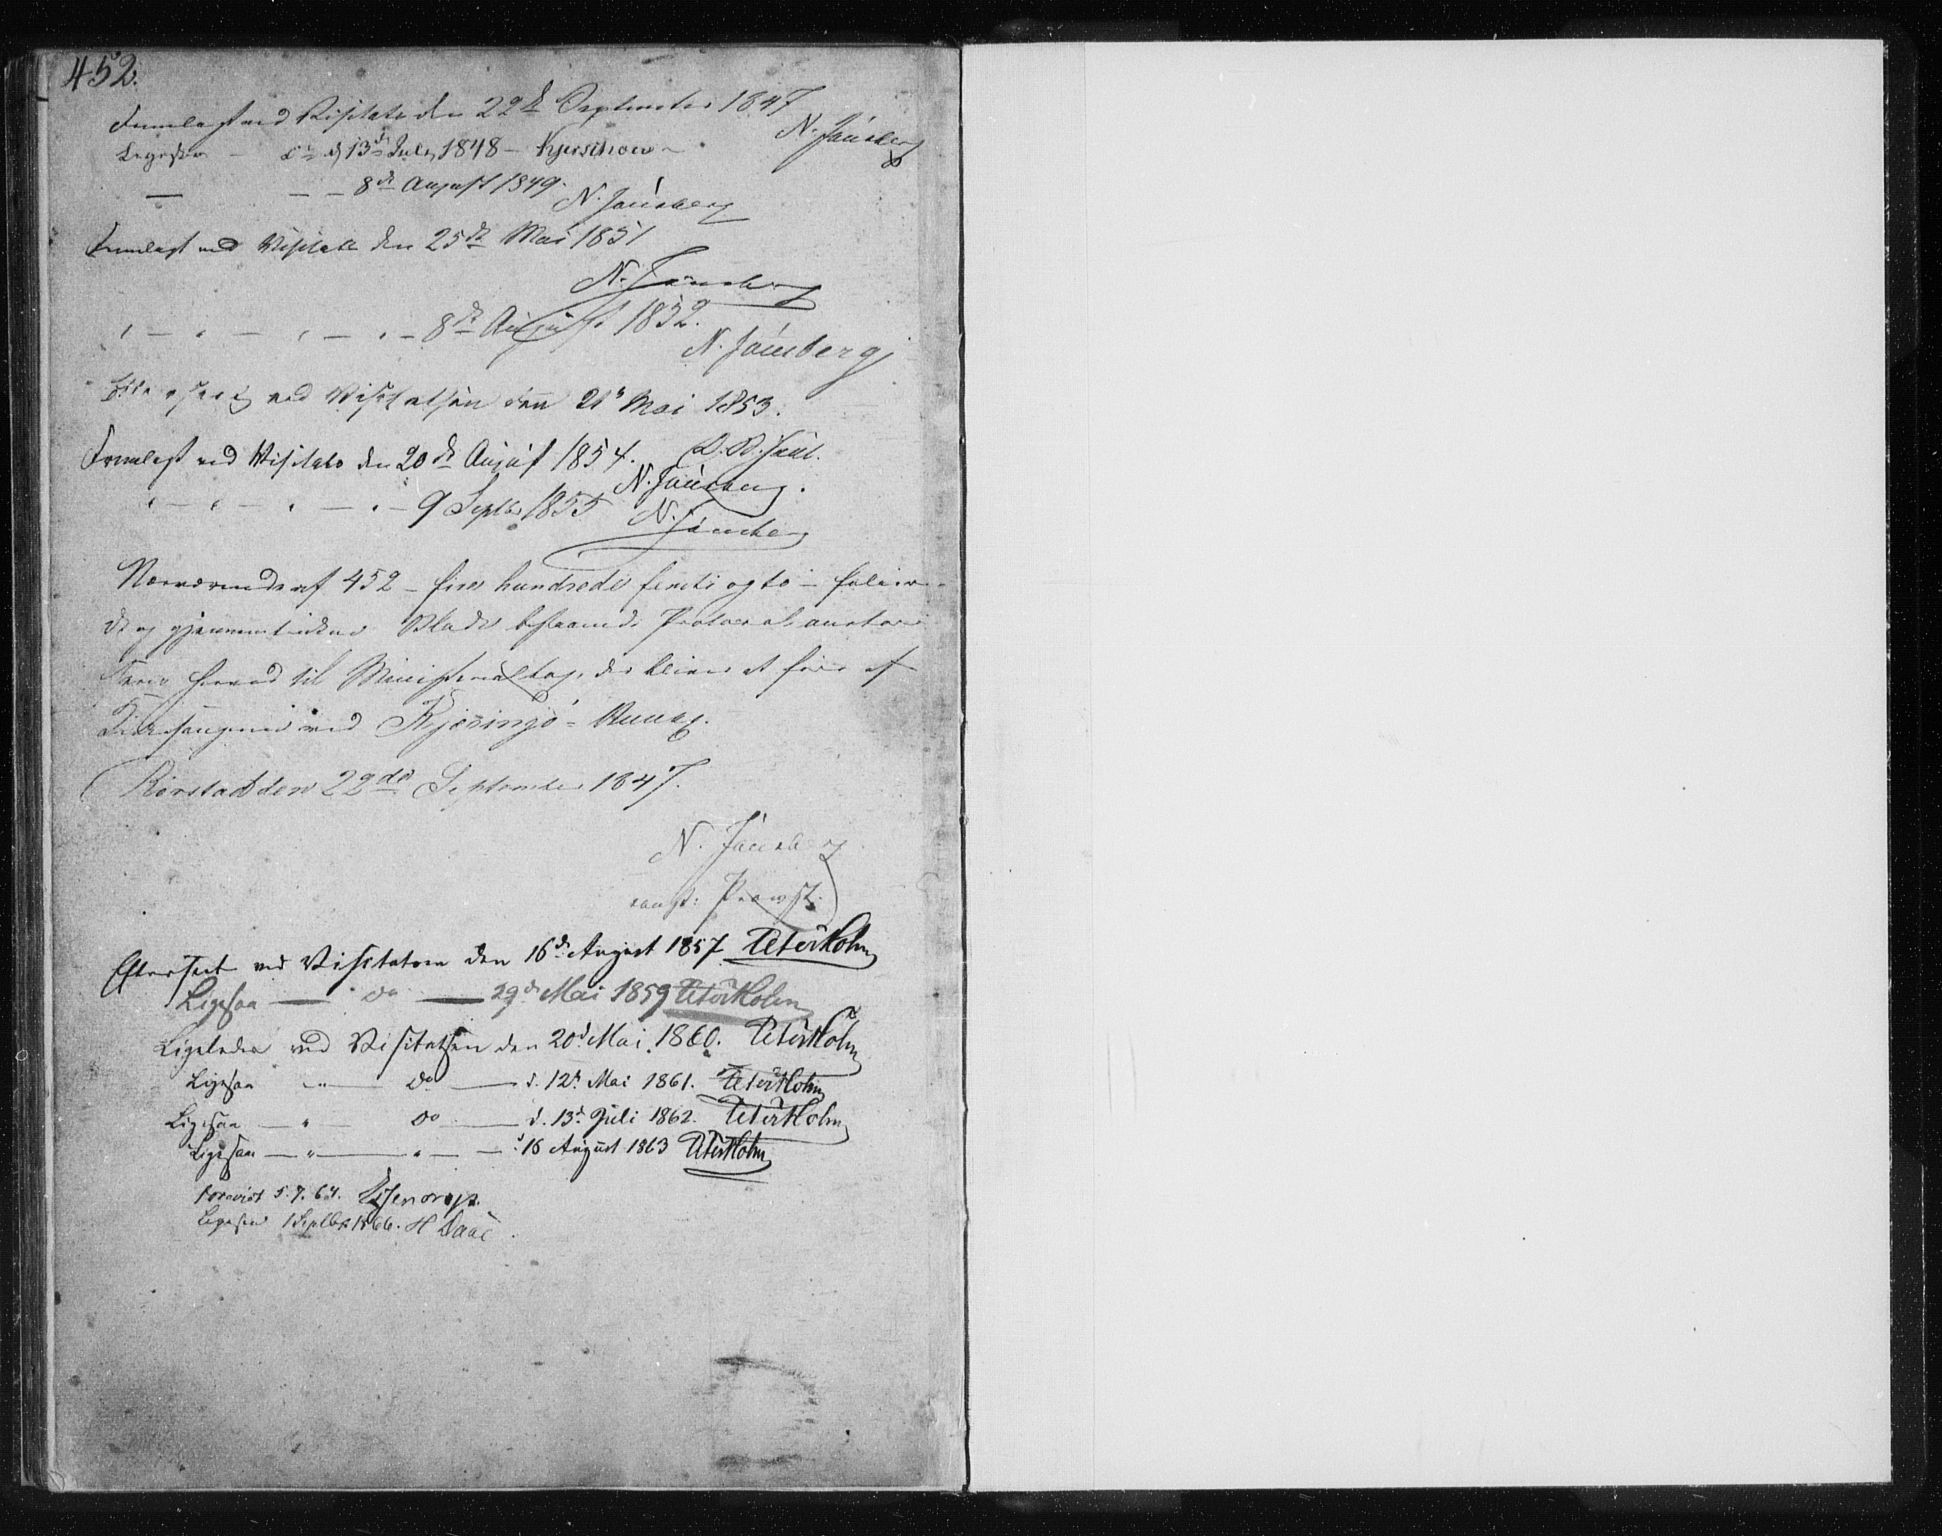 SAT, Ministerialprotokoller, klokkerbøker og fødselsregistre - Nordland, 803/L0074: Klokkerbok nr. 803C01, 1845-1866, s. 452-453